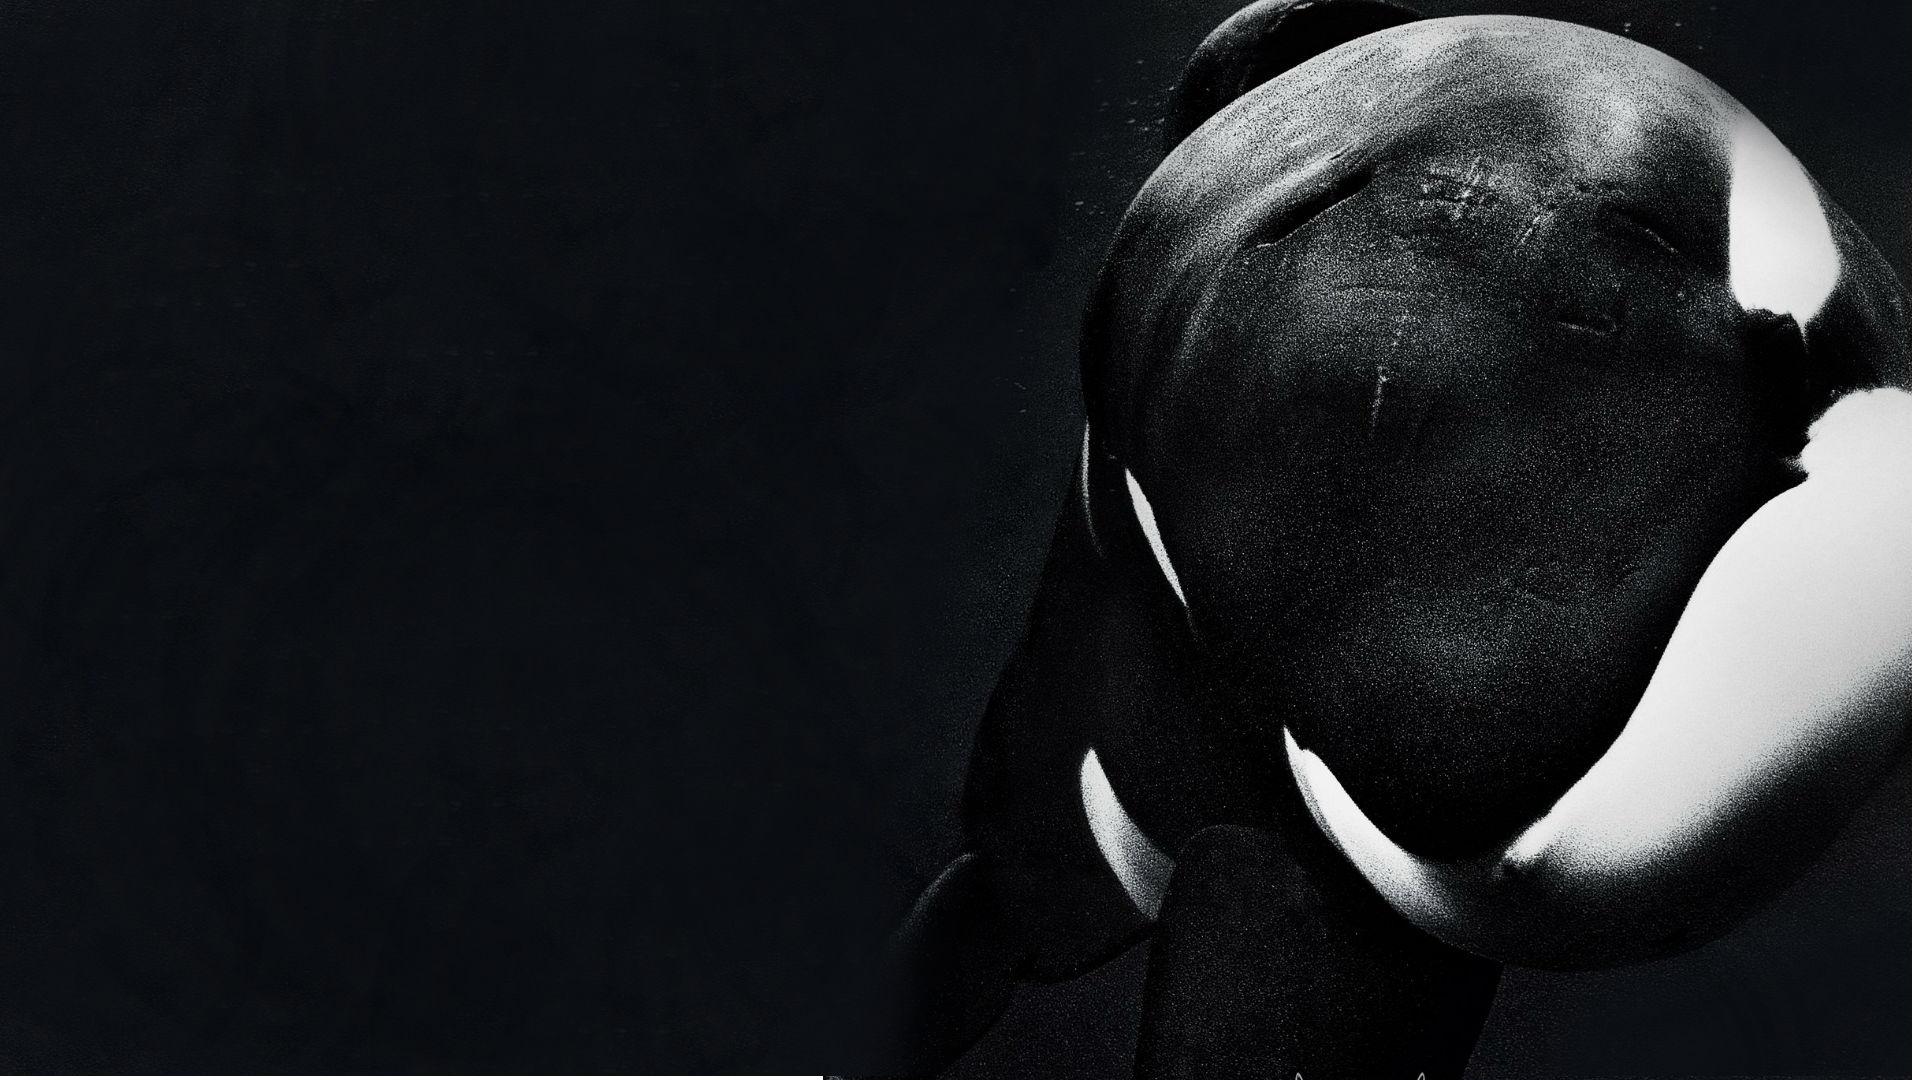 Blackfish 2013 Wallpapers   1920x1080   482586 1920x1080